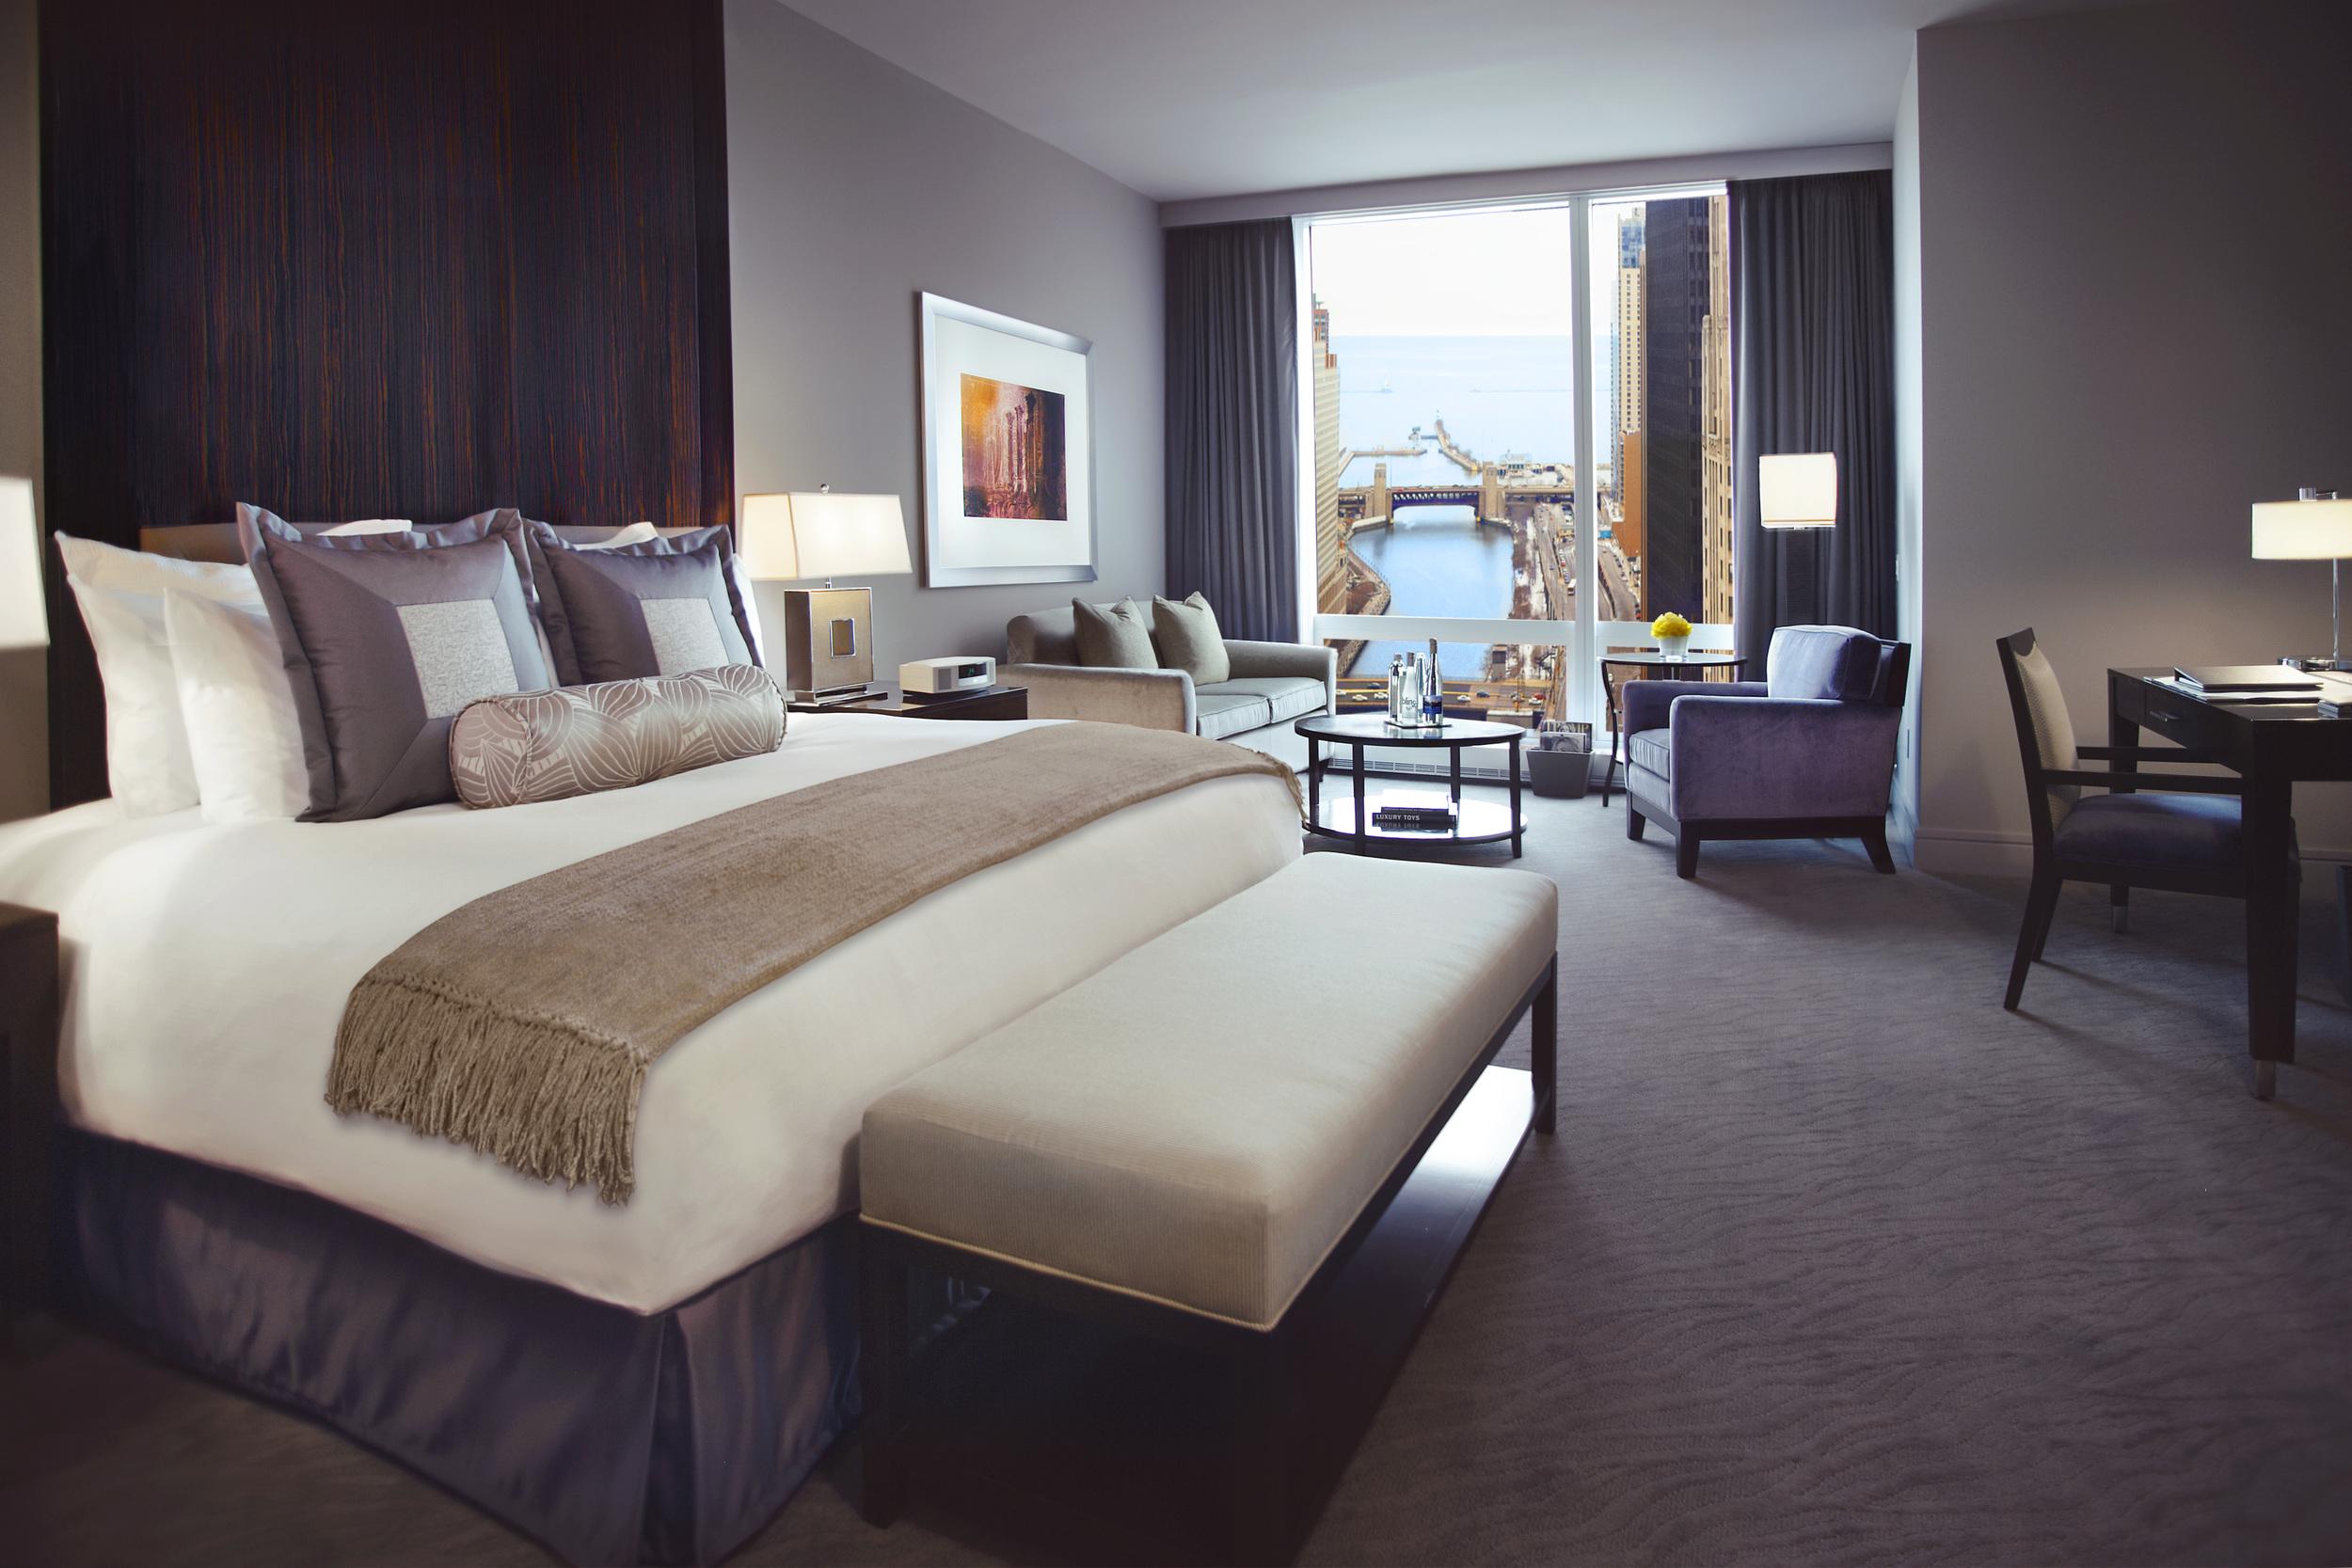 1323465022-Bedroom-with-River-Shot.jpg